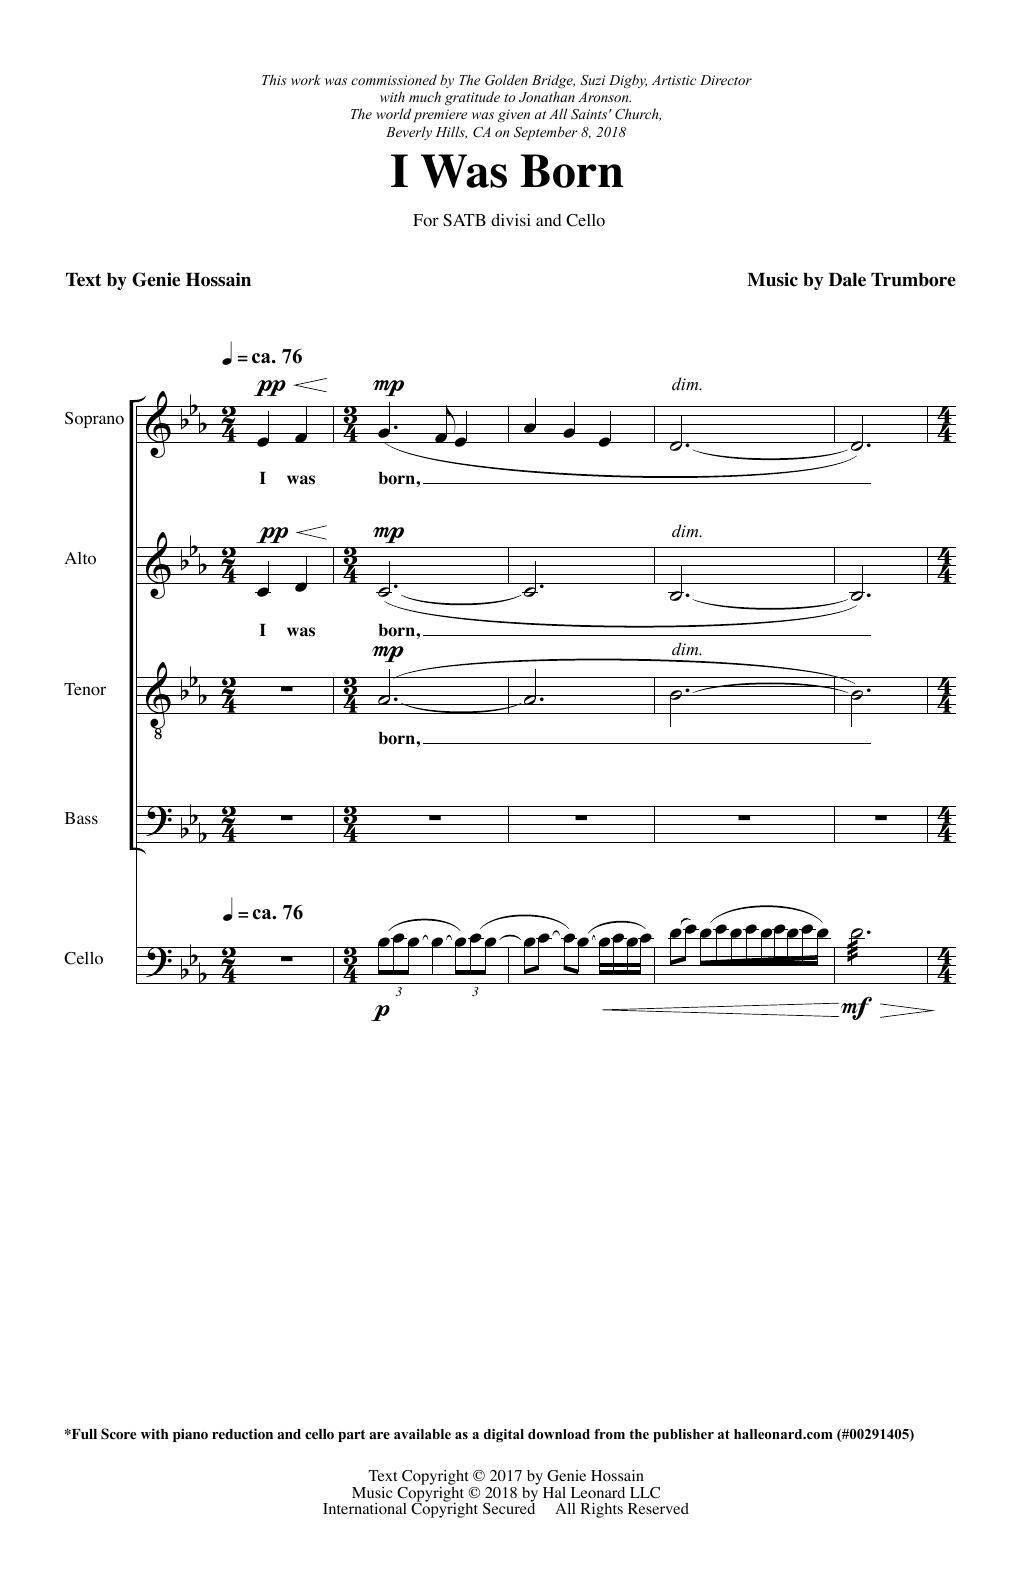 I Was Born (SATB Choir)